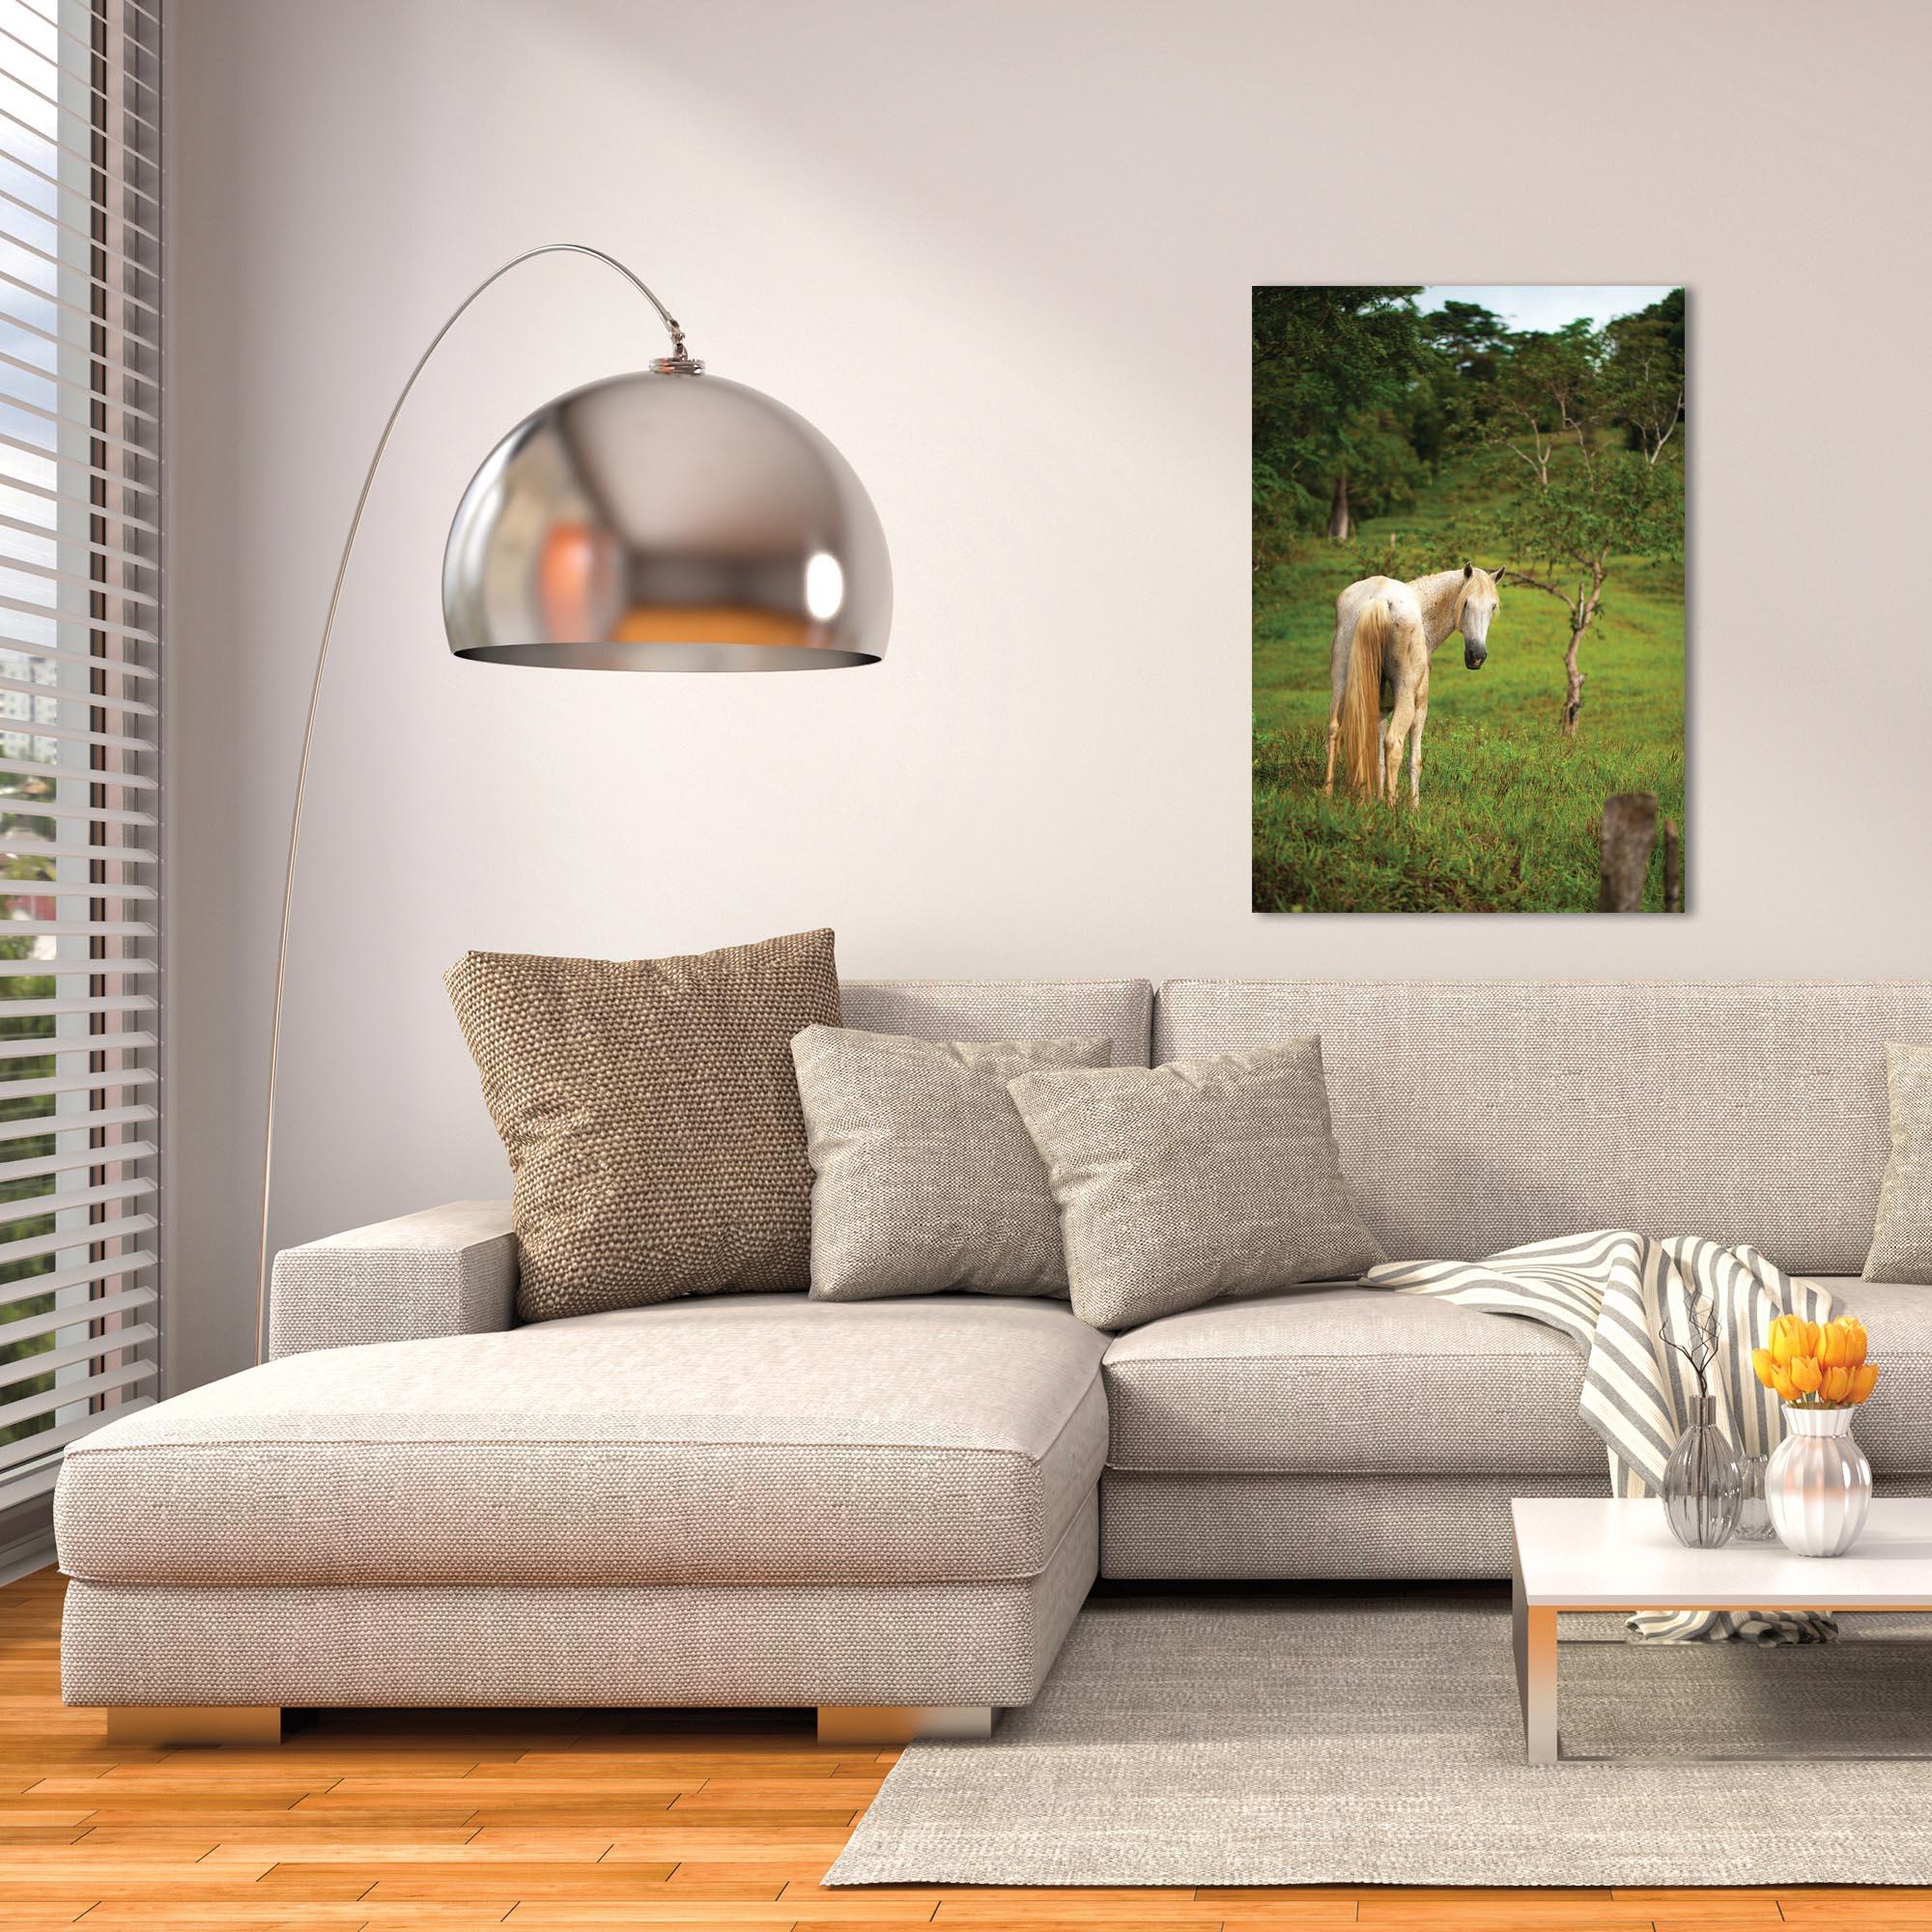 Western Wall Art 'Equine Invitation' - Horses Decor on Metal or Plexiglass - Lifestyle View